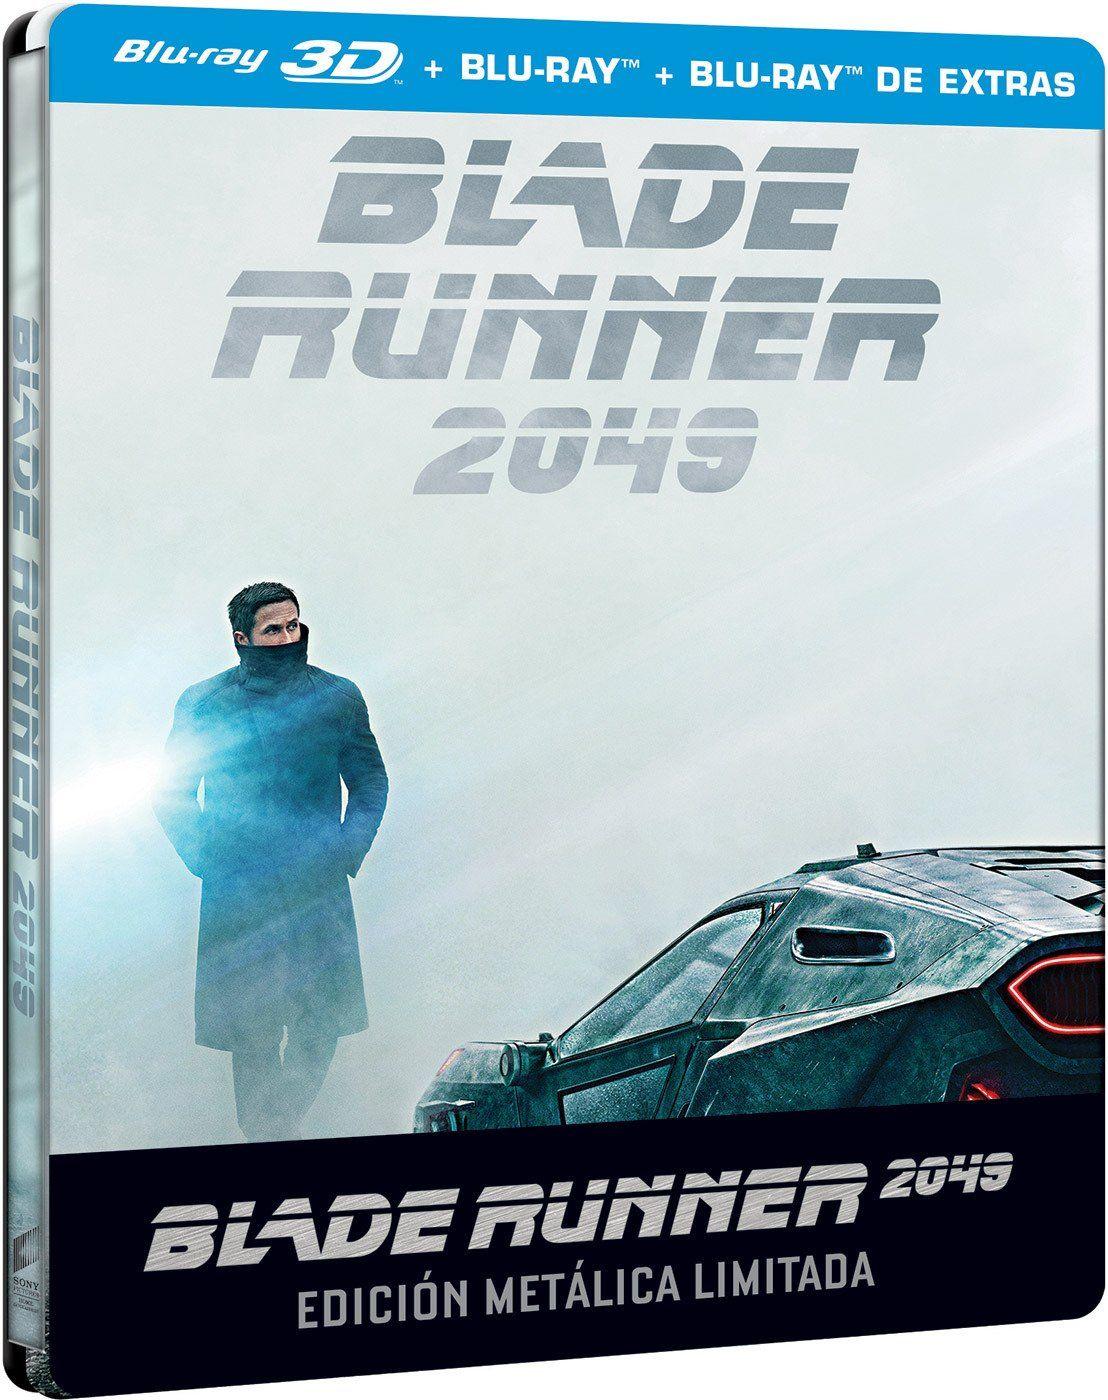 Blade Runner 2049 Bd 3d Bd Bd Extras Edici N Especial Metal Limitada Blu Ray Bd Extras Blade Runner Blade Runner Gran Tiburón Blanco Dvd